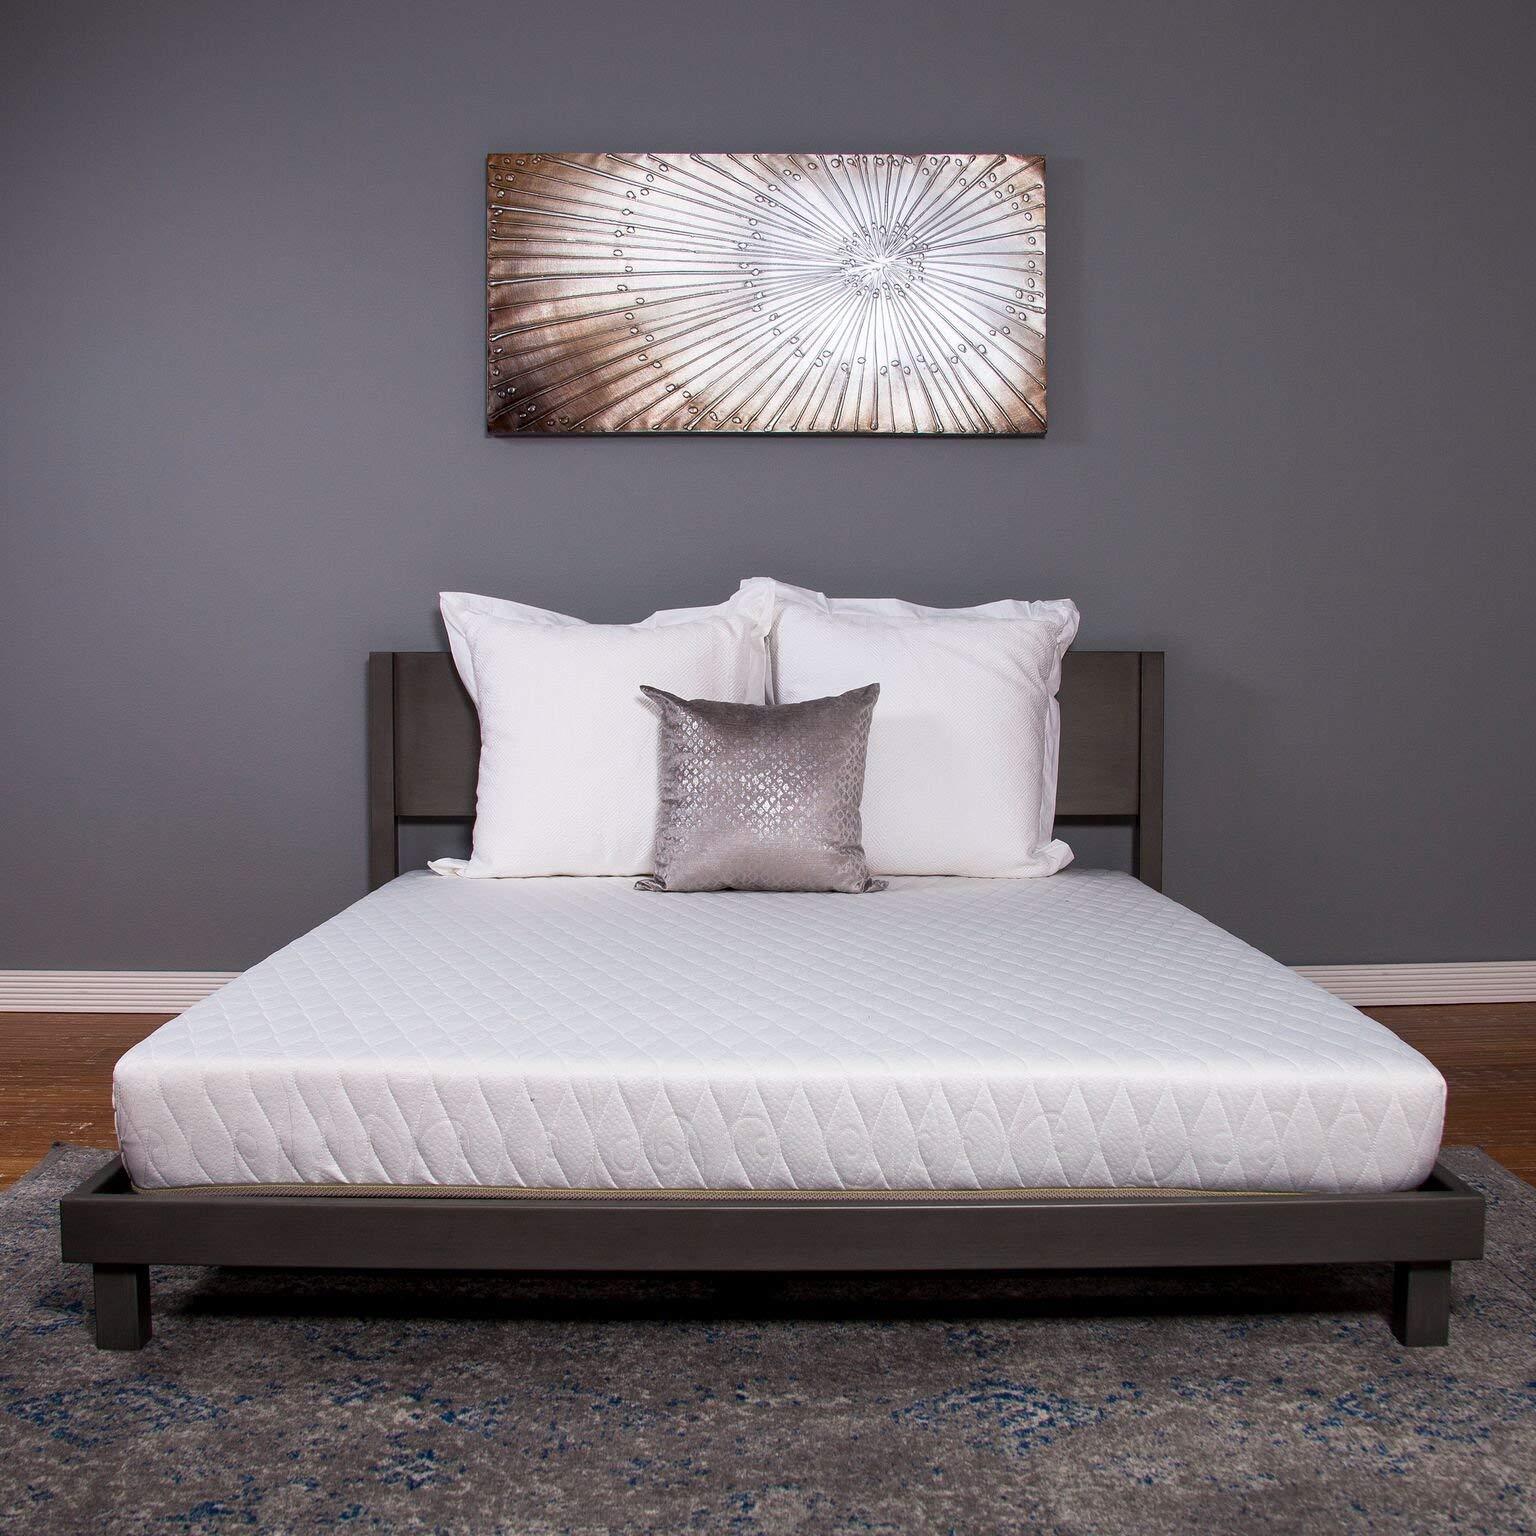 Dreamfoam Bedding Chill 6'' Gel Memory Foam Mattress, Twin- Made in The USA